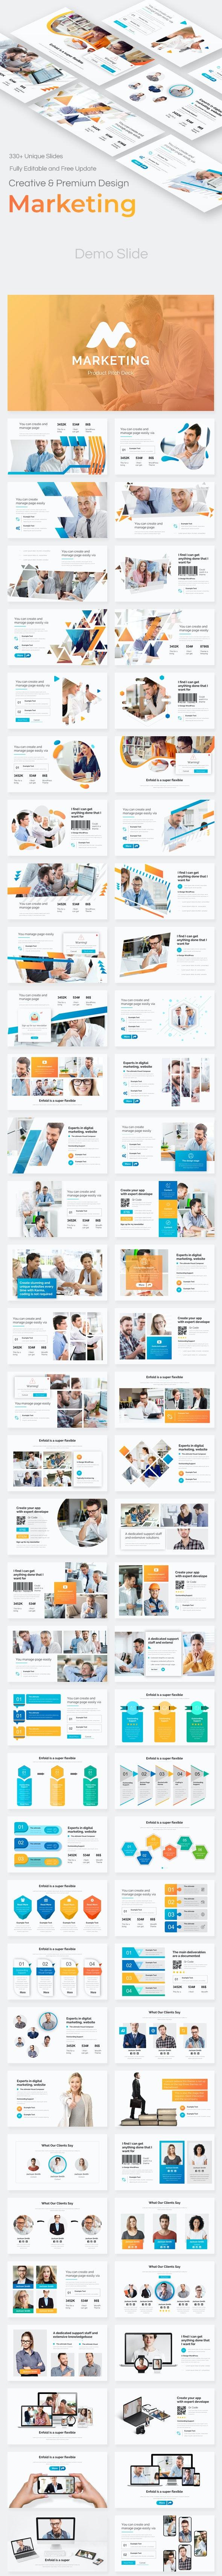 Product Marketing Pitch Deck Google Slide Template - Google Slides Presentation Templates